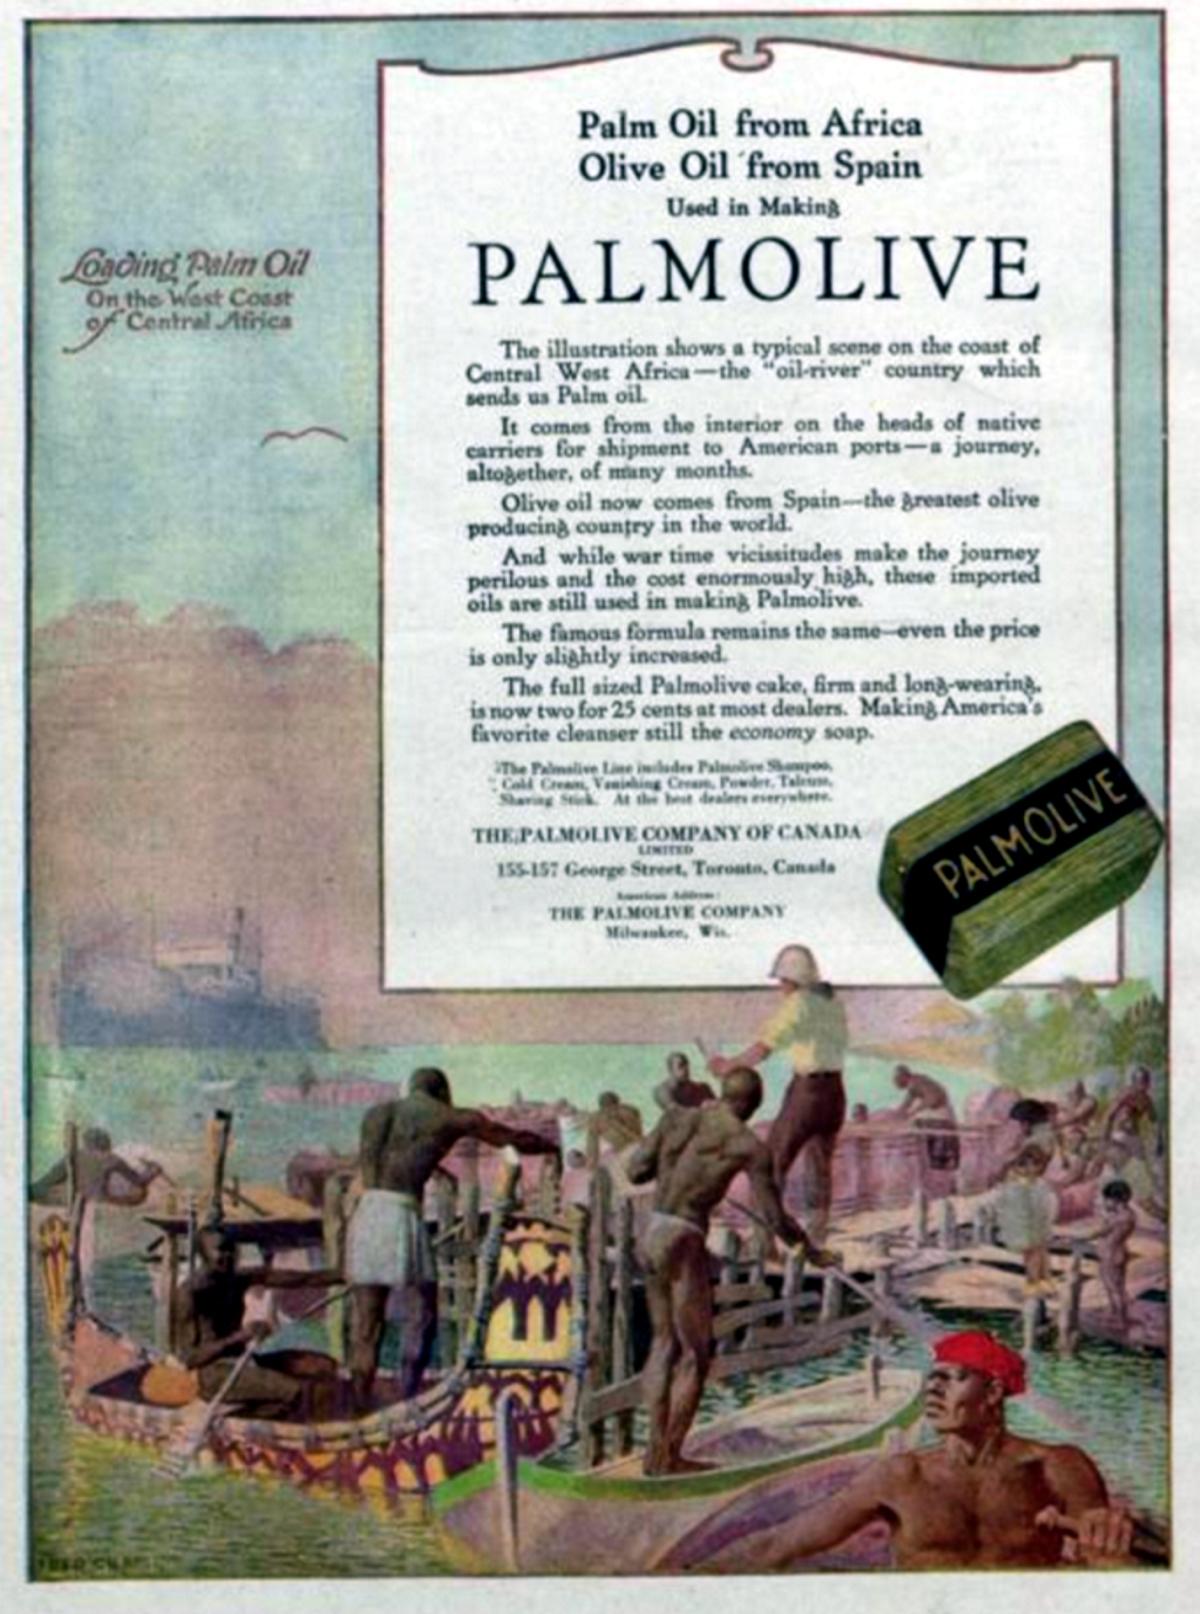 19171110-cdncour-vol-xxii-no-24-sexy-black-men-palmolive-ad-2